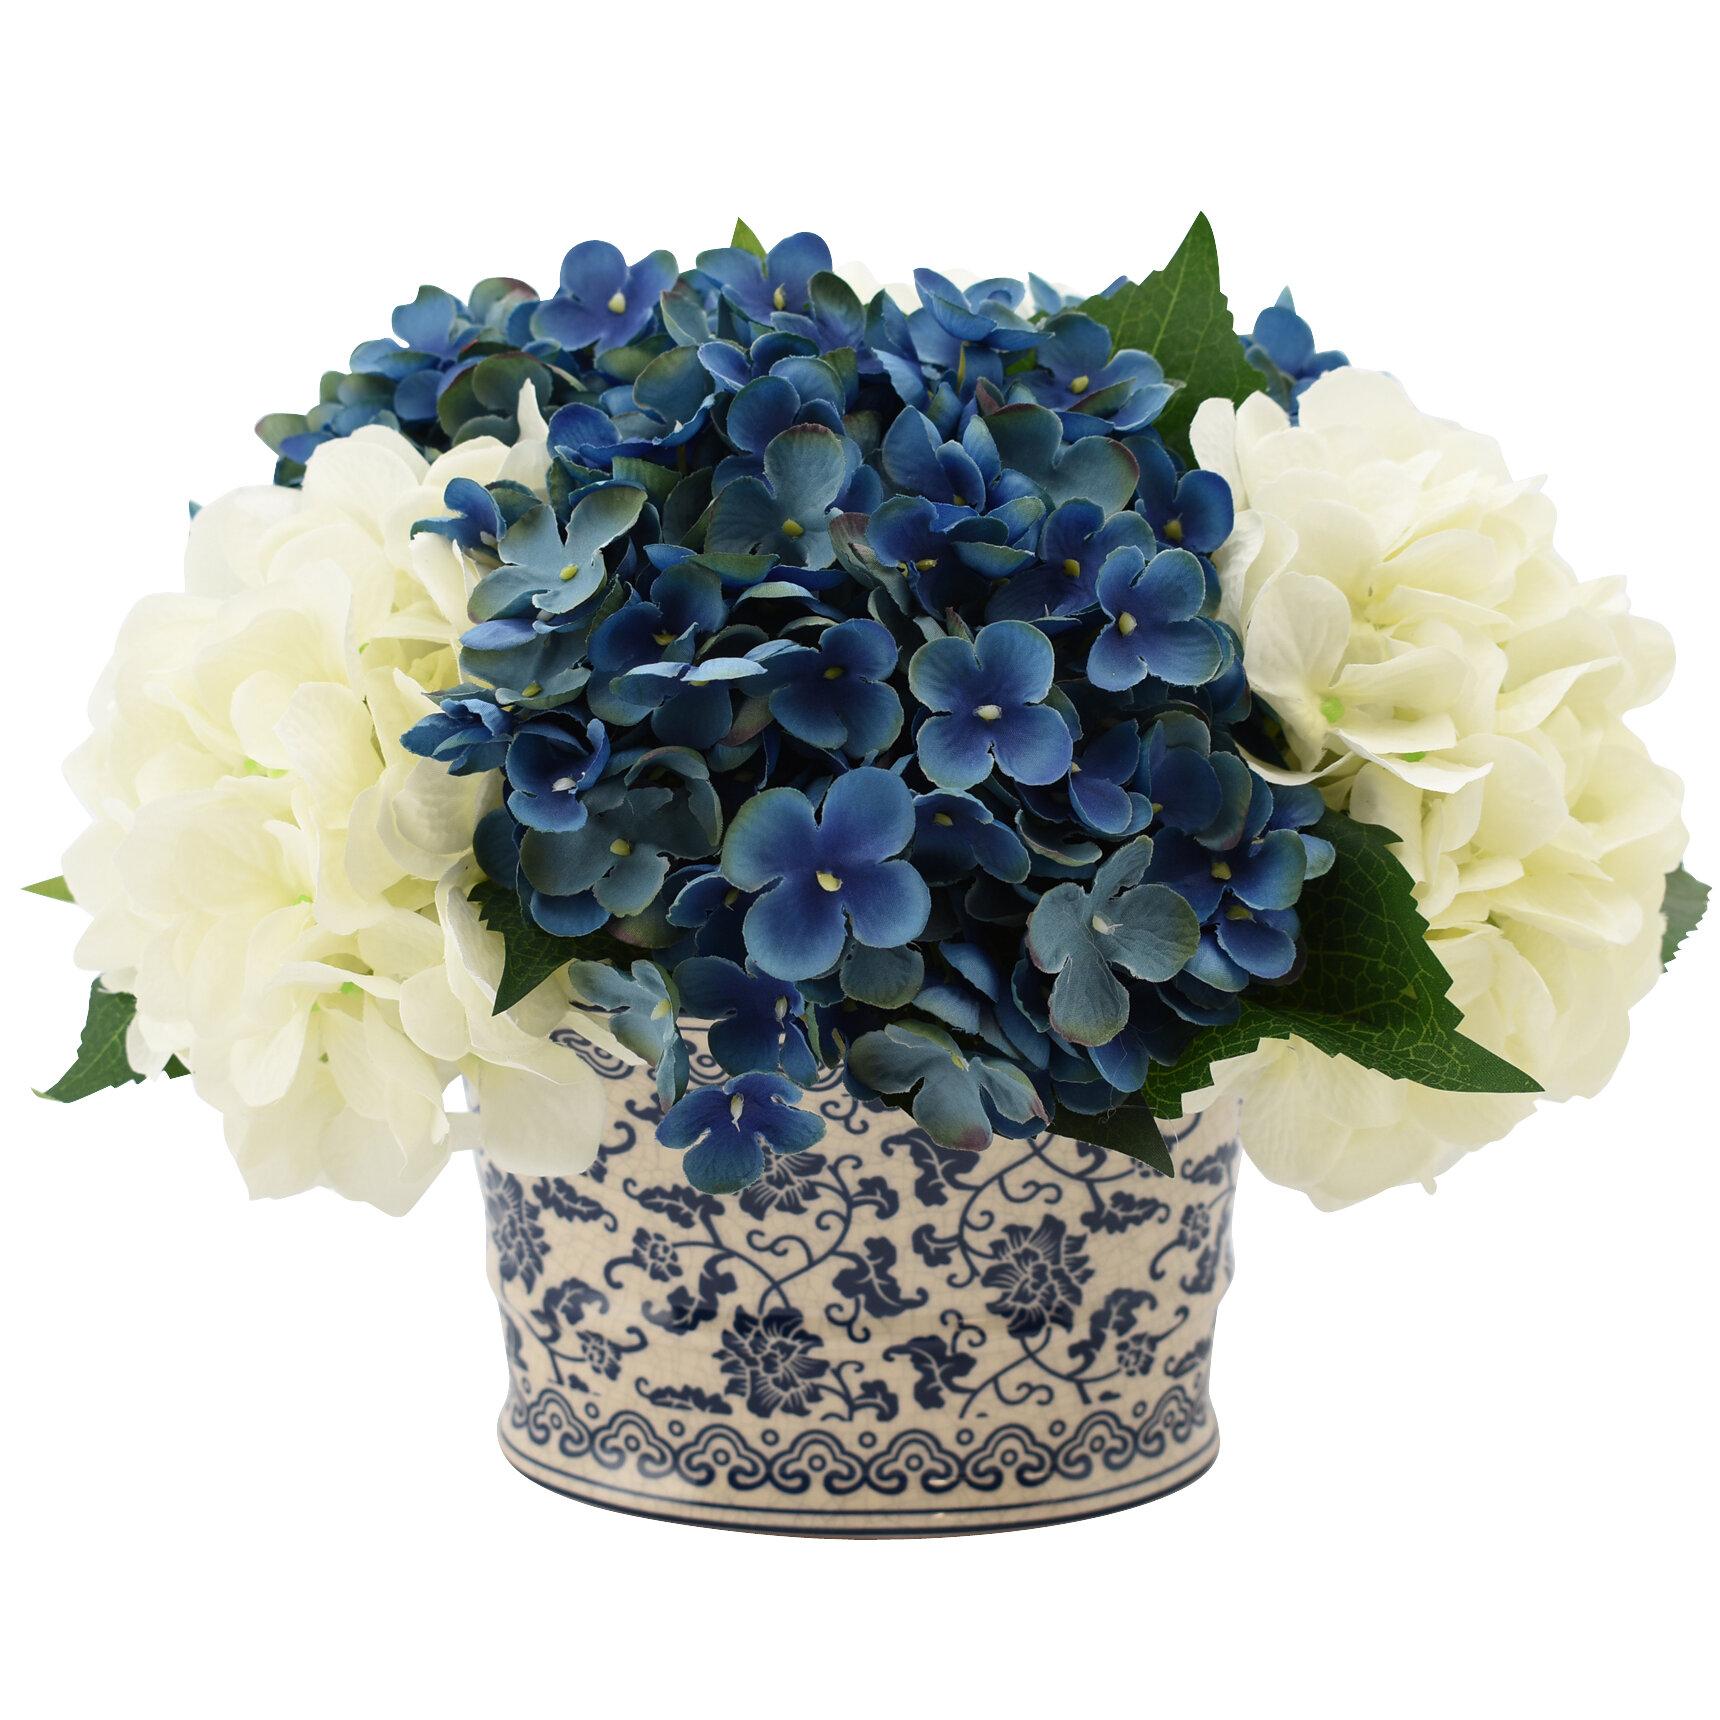 9d91b81a8216 Hydrangea Floral Arrangement in Chinoiserie Vase   Reviews